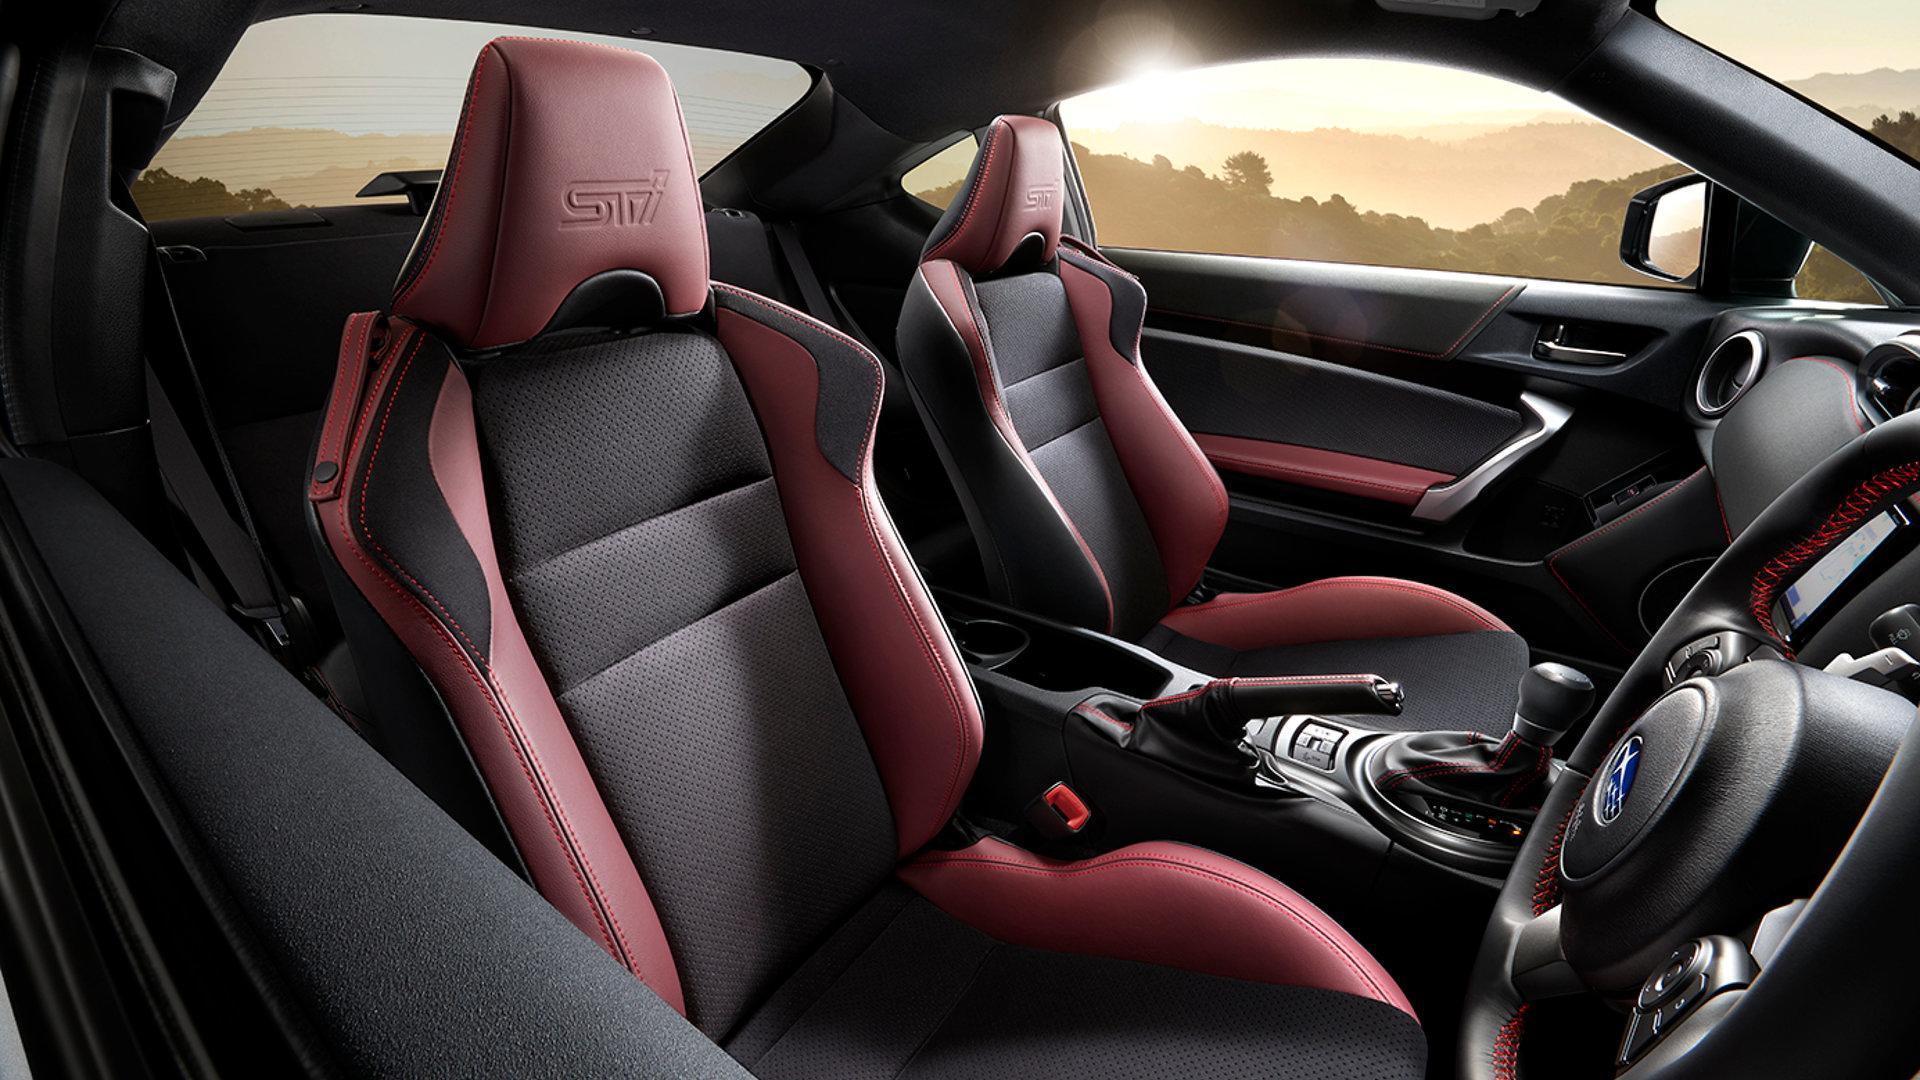 Subaru Impreza S208 I Brz Sti Sport Oficjalnie Motofilm